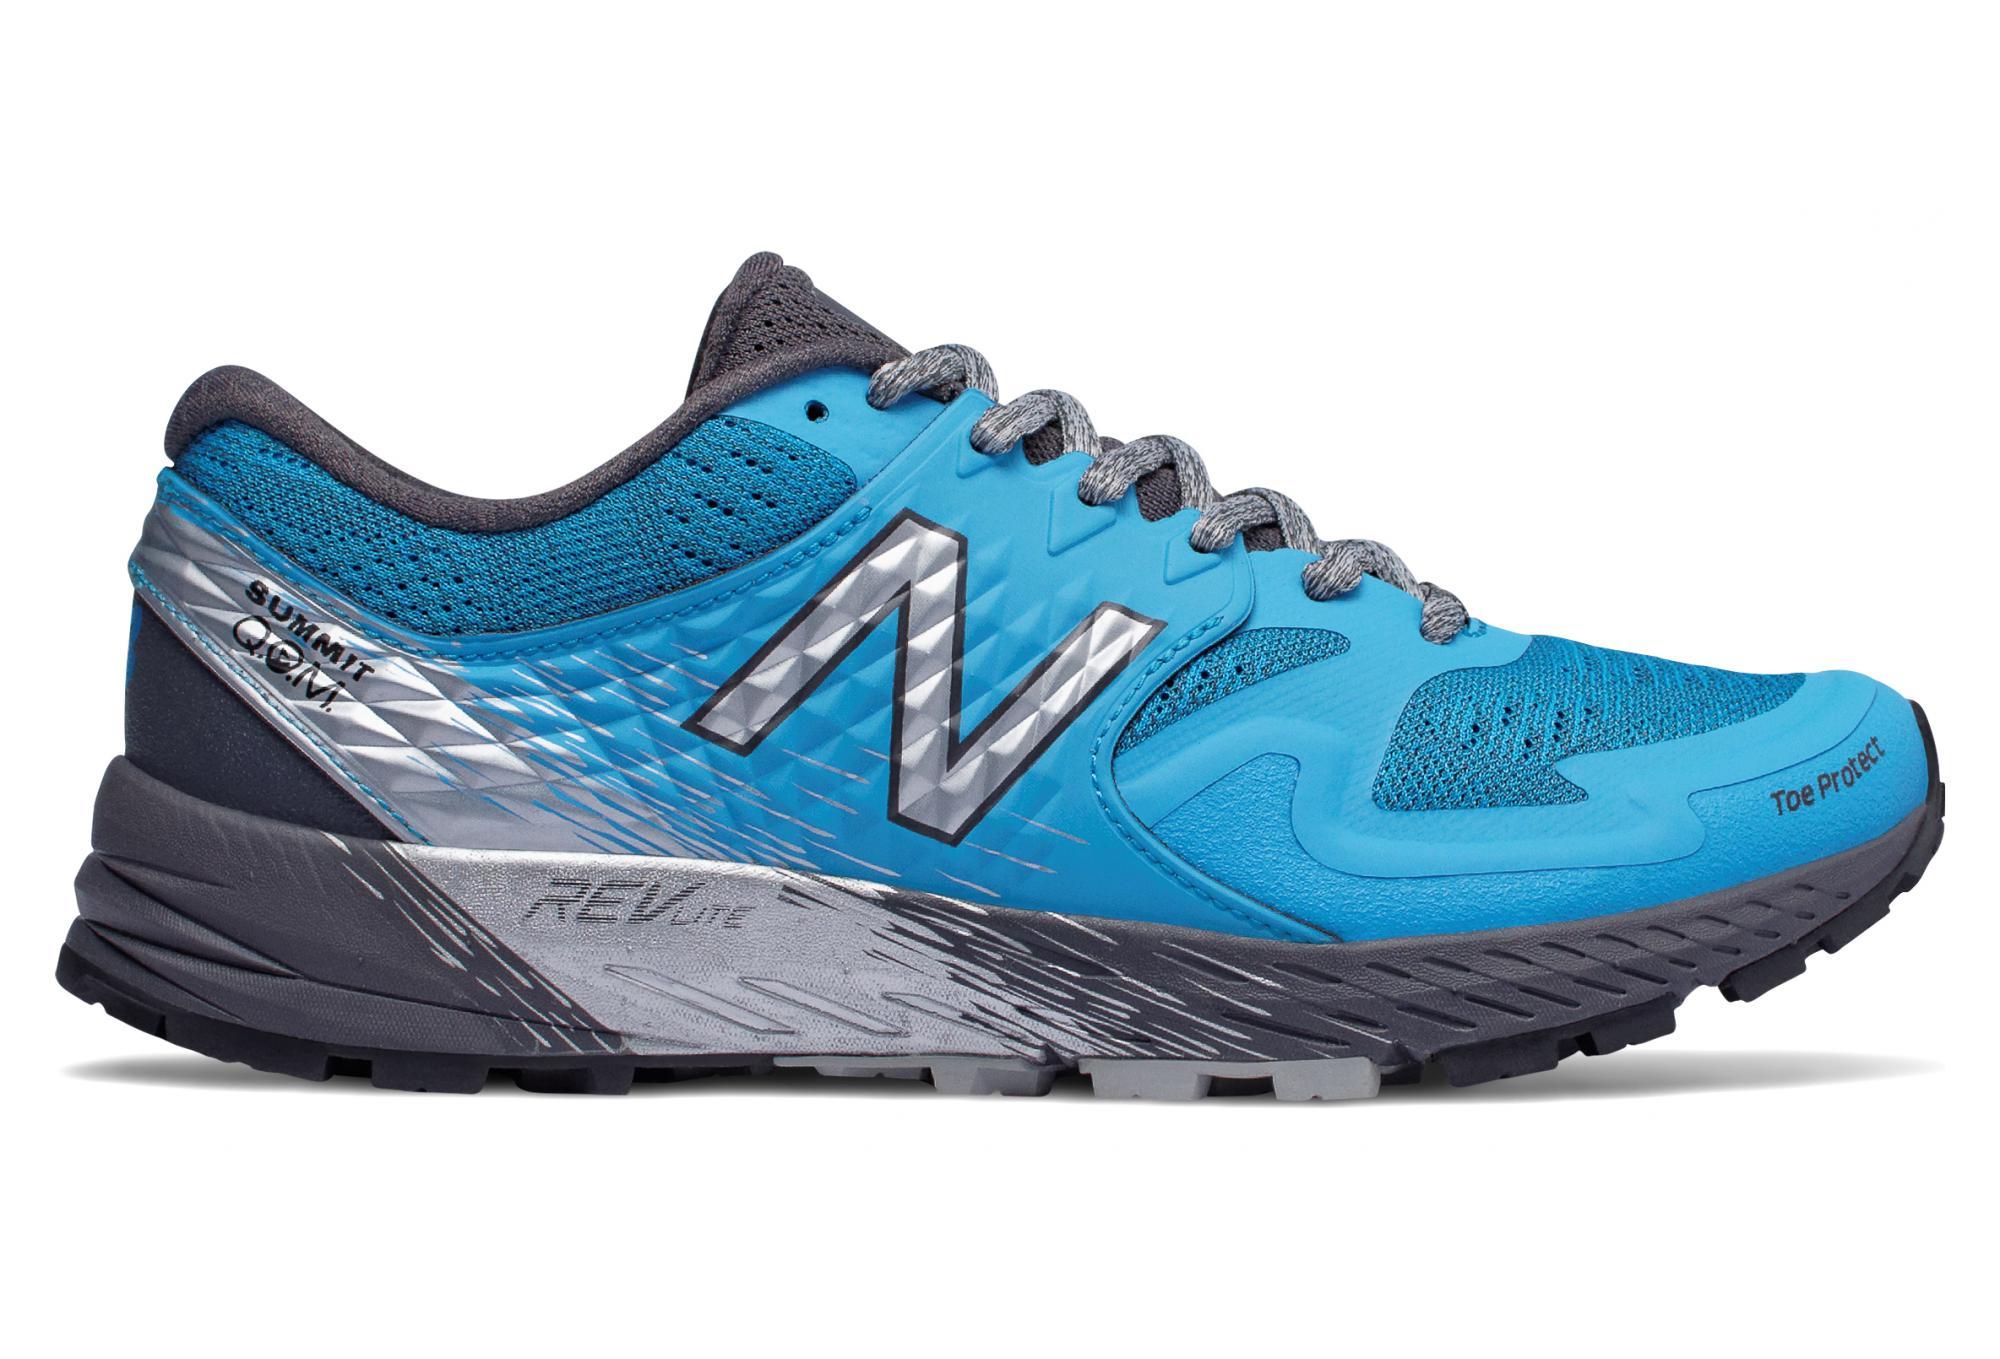 m Summit K Trail King Balance Chaussures De Of o New Femme H8AqwTw7x